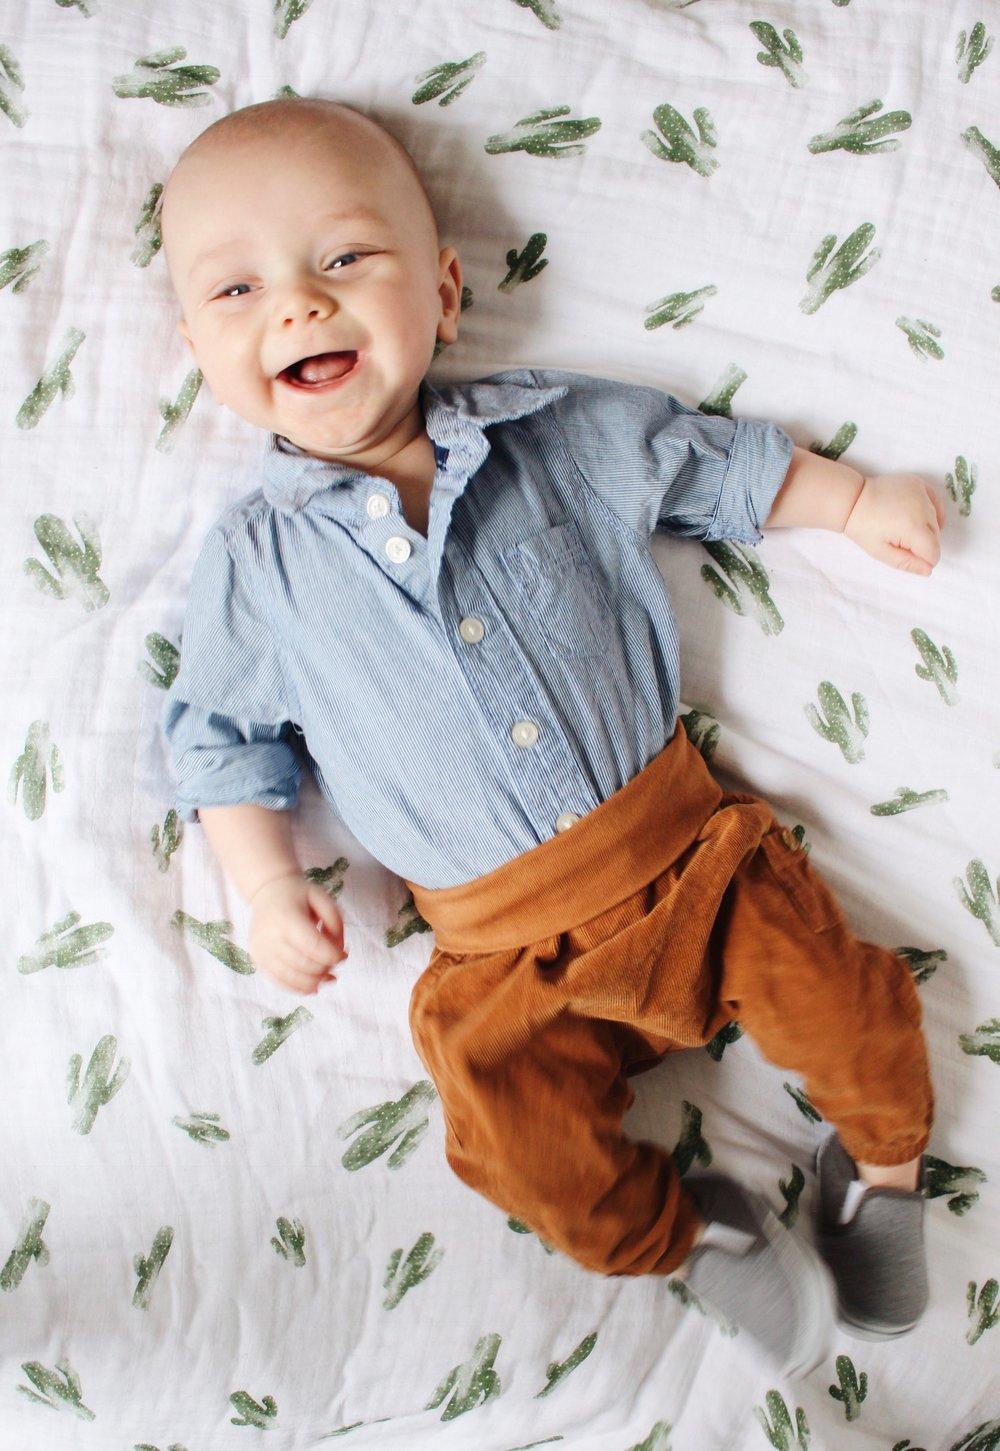 Rhys, 4 months